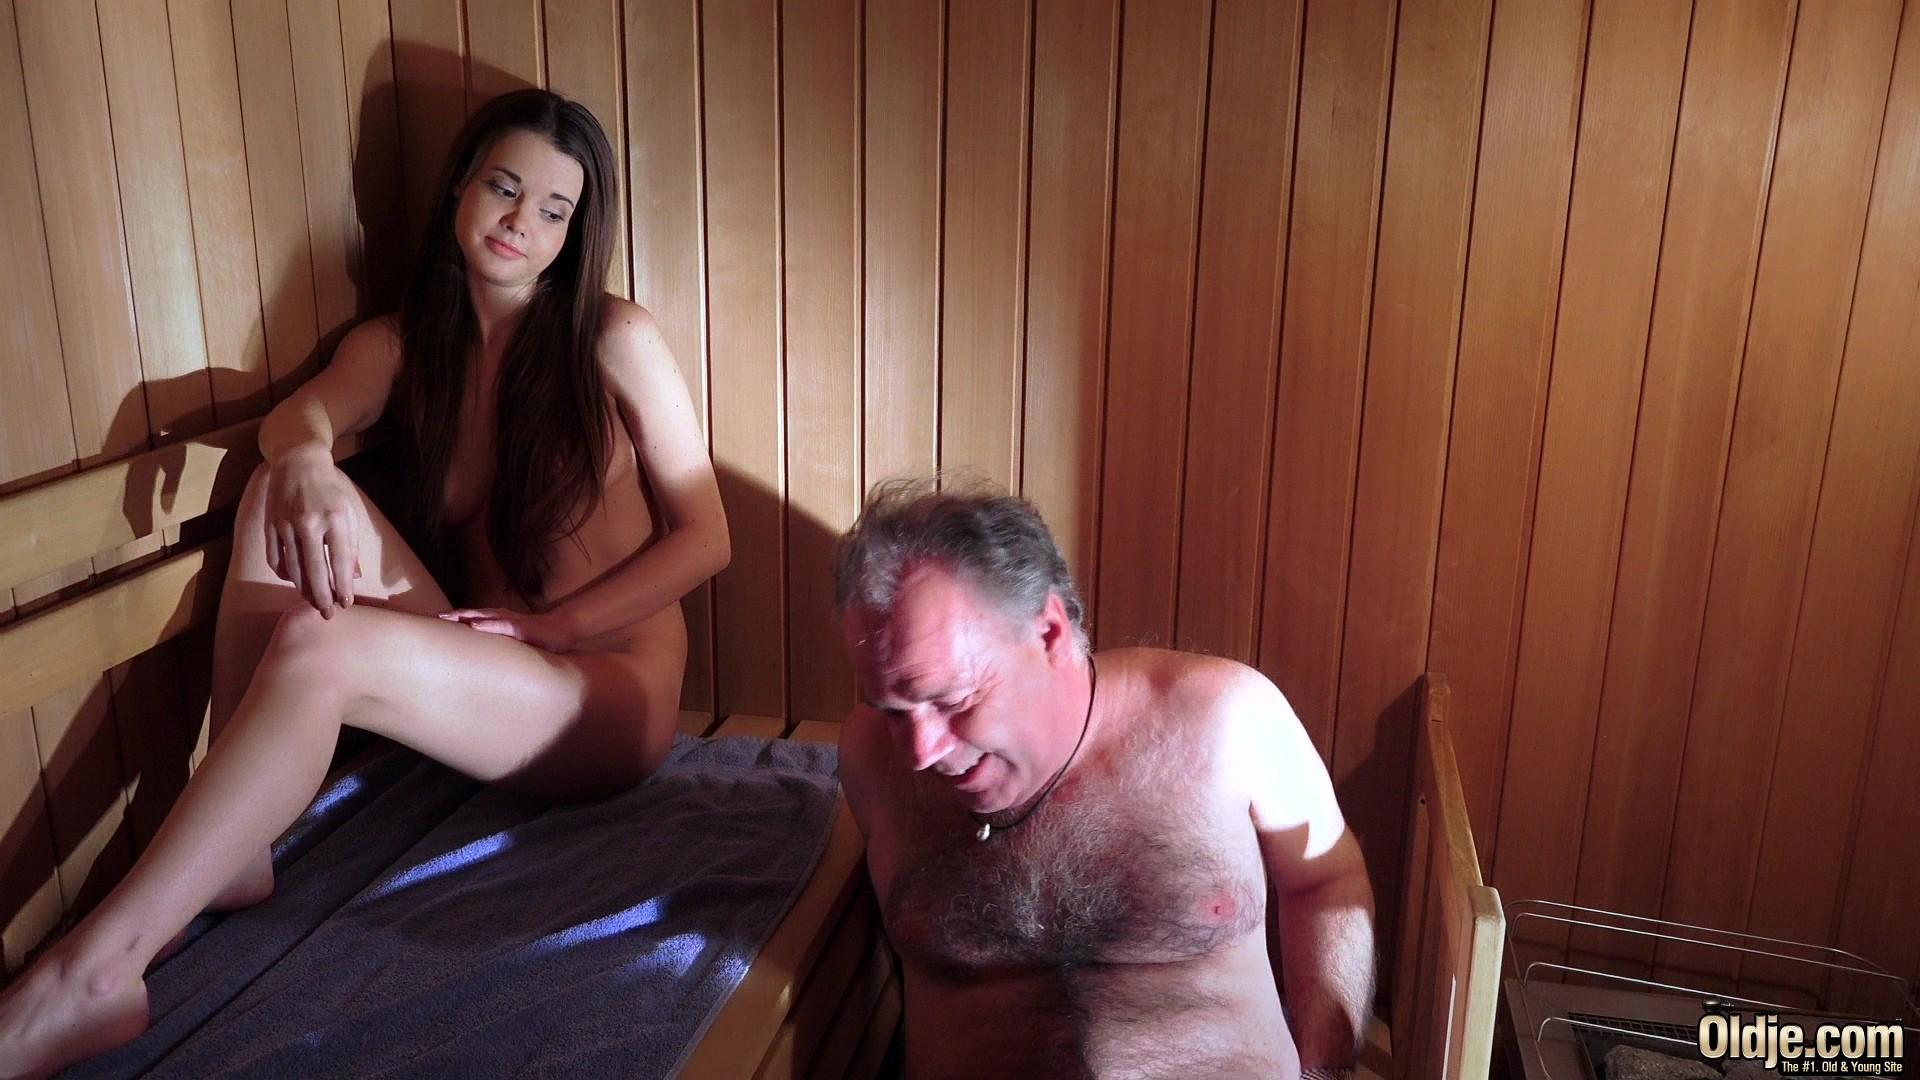 stariki-v-saune-porno